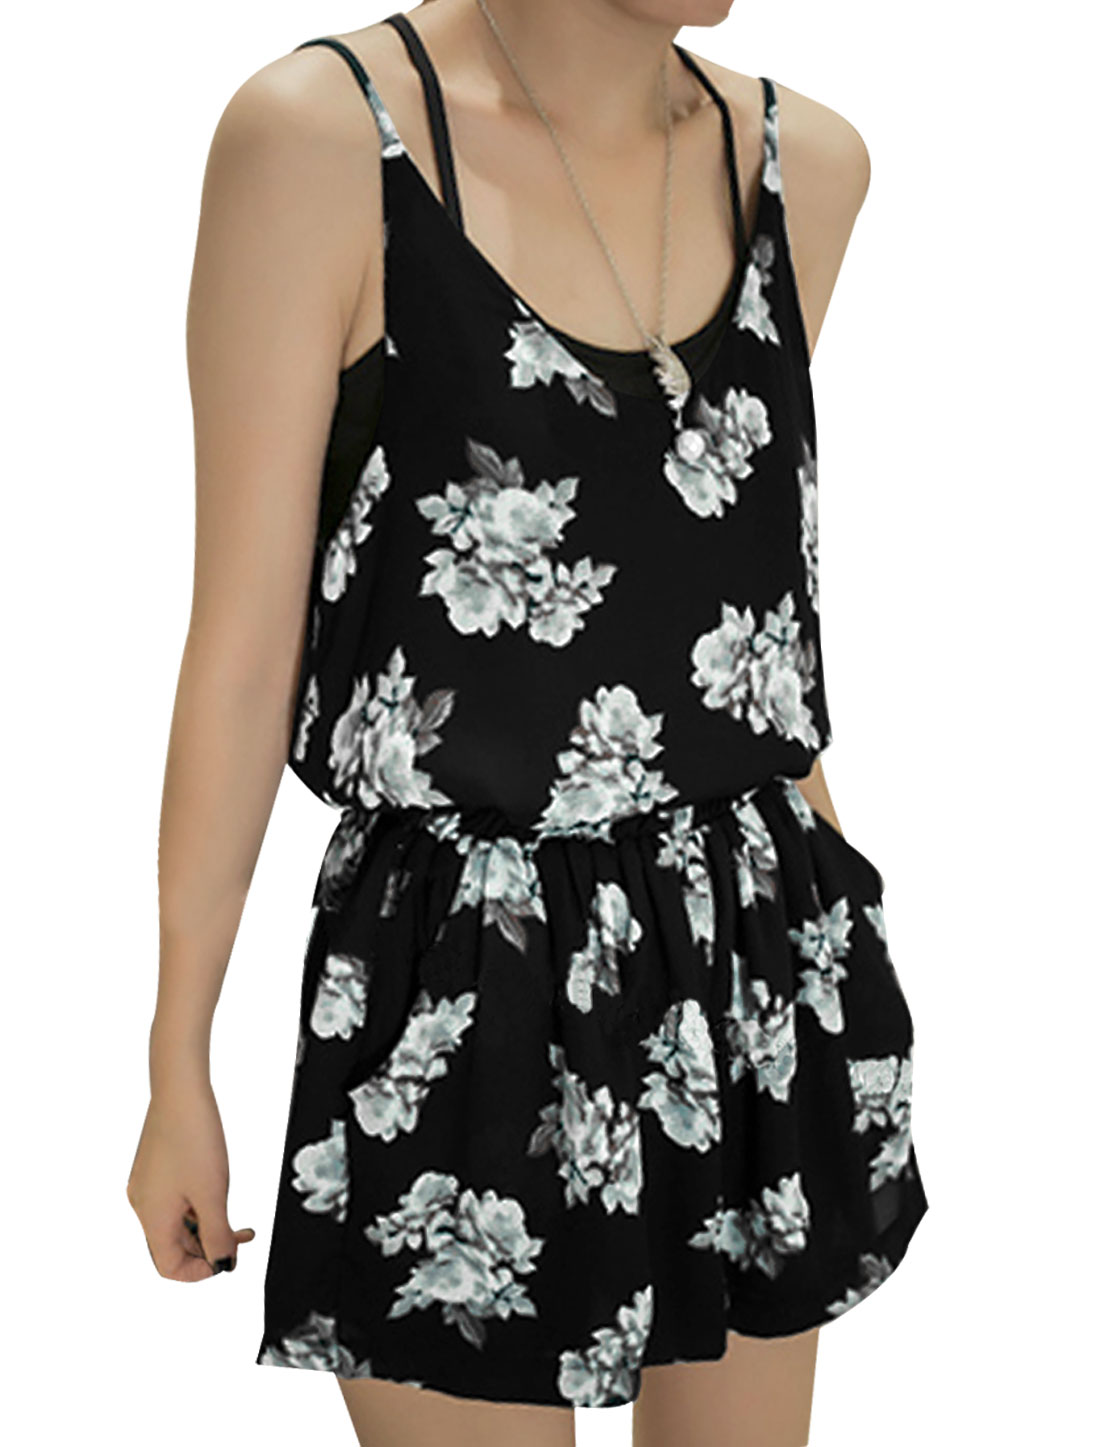 Lady Spaghetti Straps Floral Prints Chiffon Cami w Elastic Waist Shorts Set Black XS